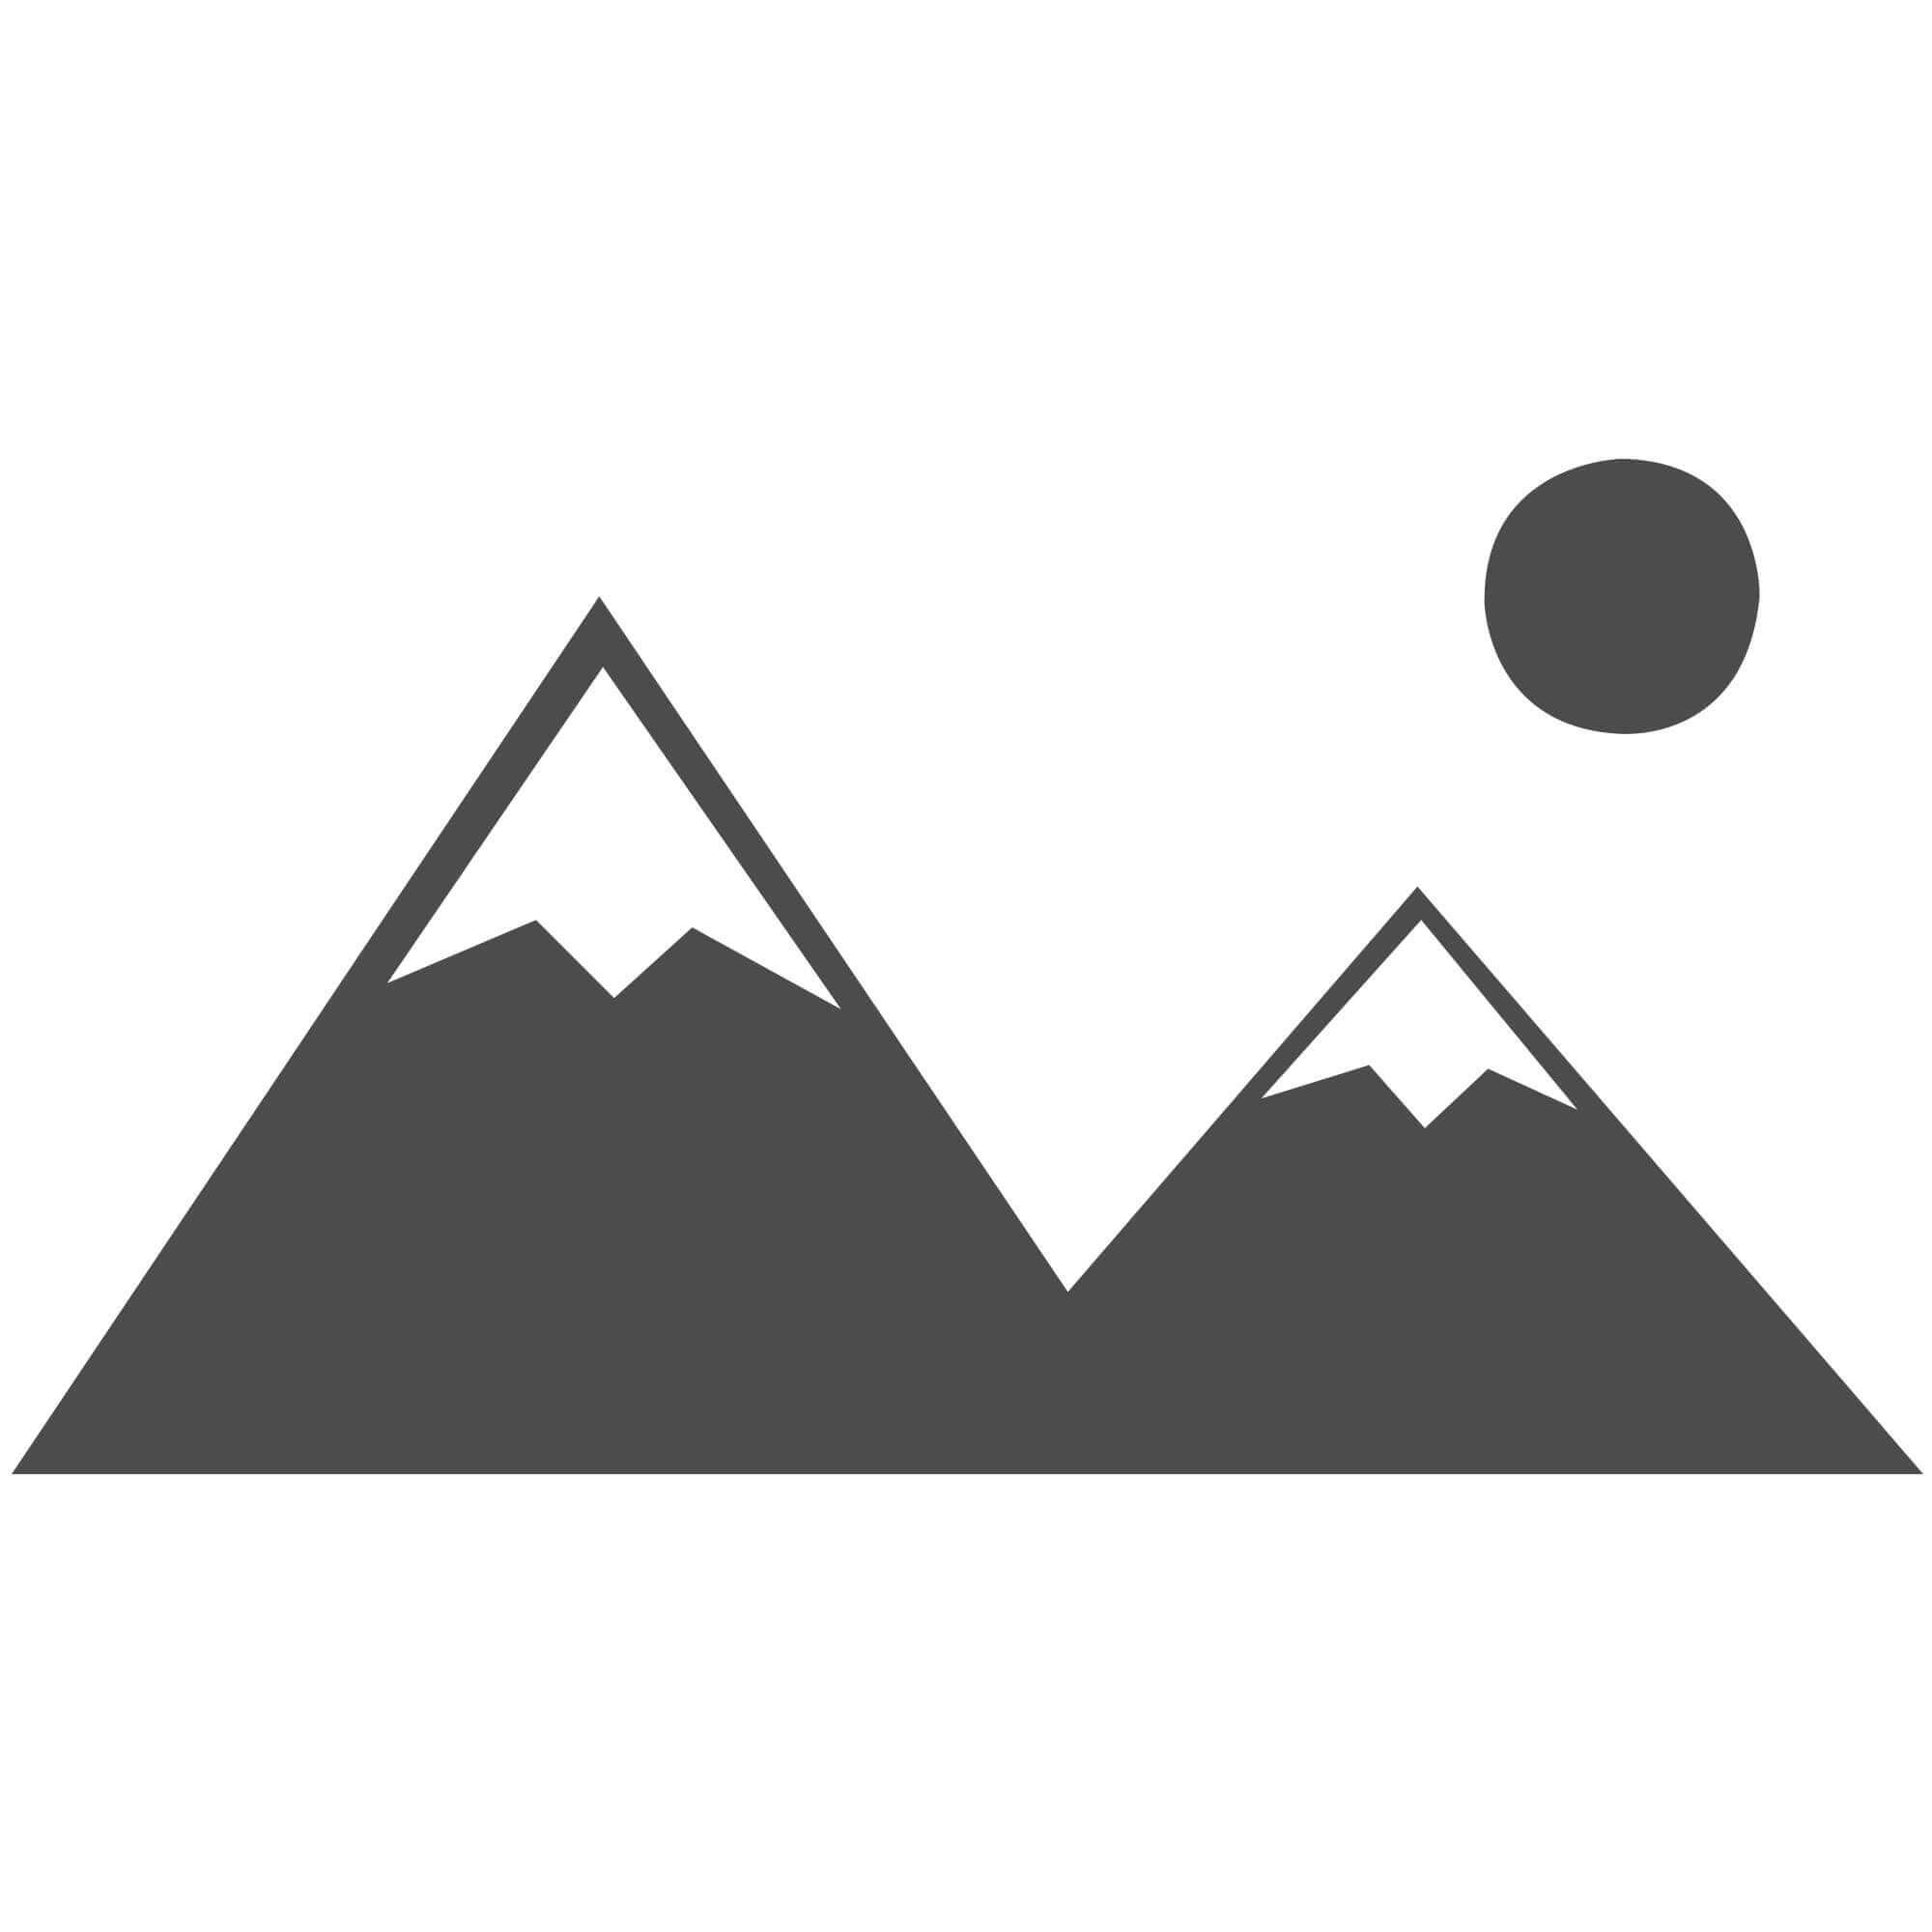 "Shatter Rug - Black Grey - Size 120 x 170 cm (4' x 5'7"")"